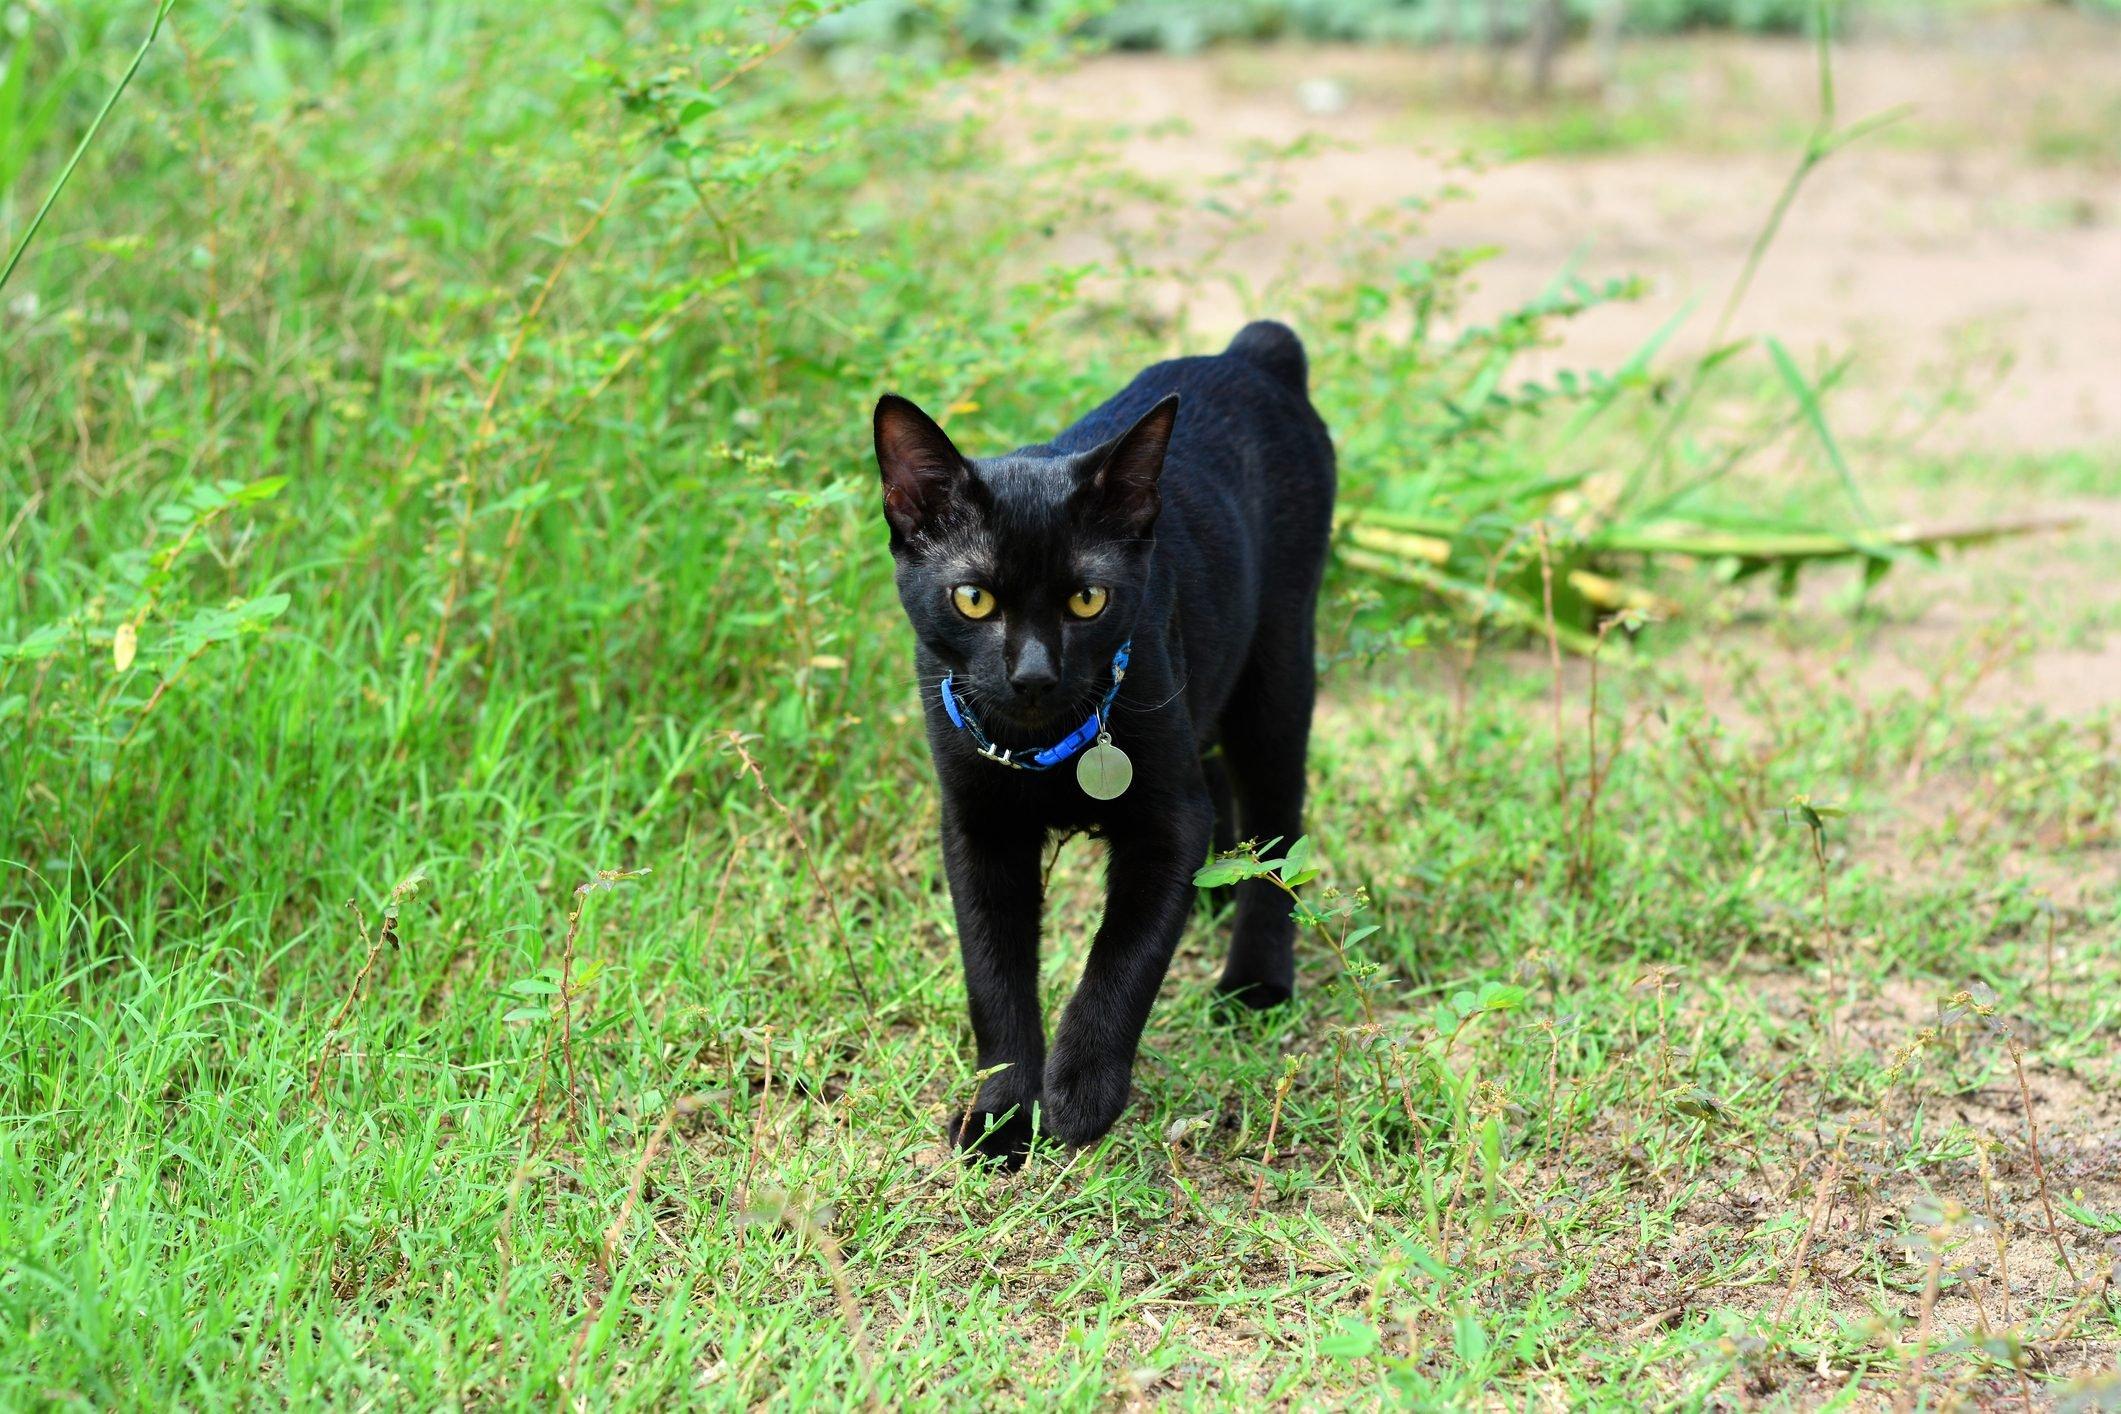 Gato bobtail preto andando pela grama